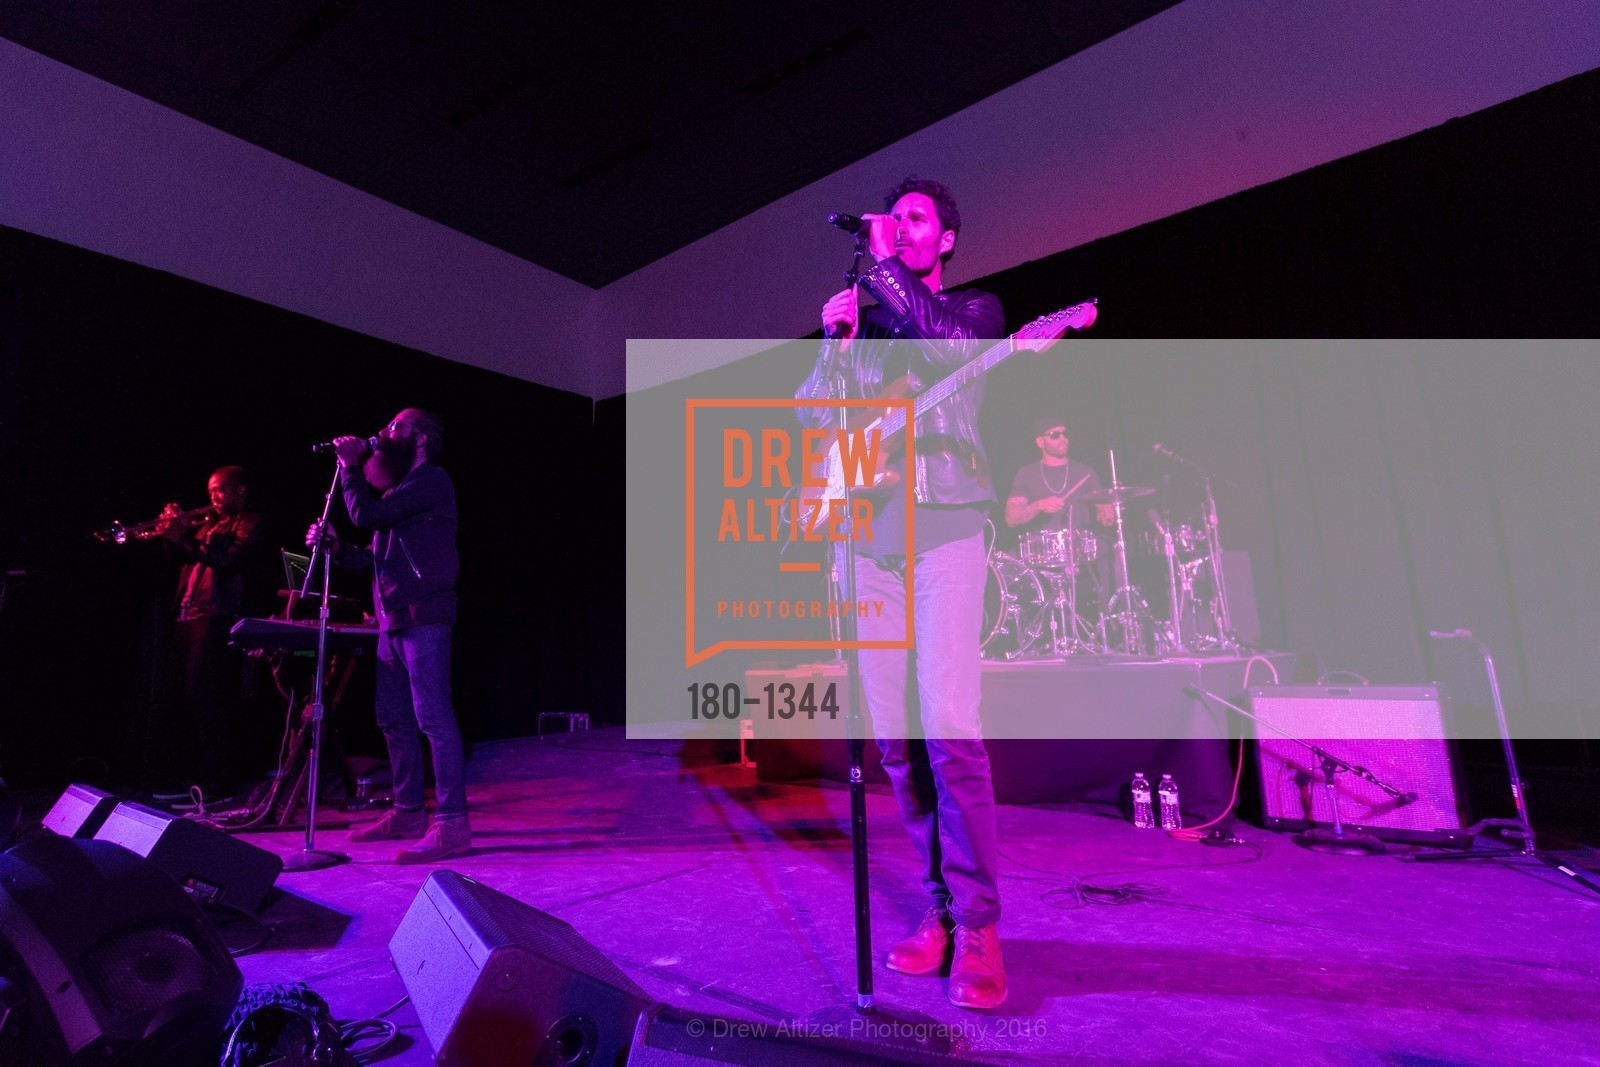 Performance, Photo #180-1344